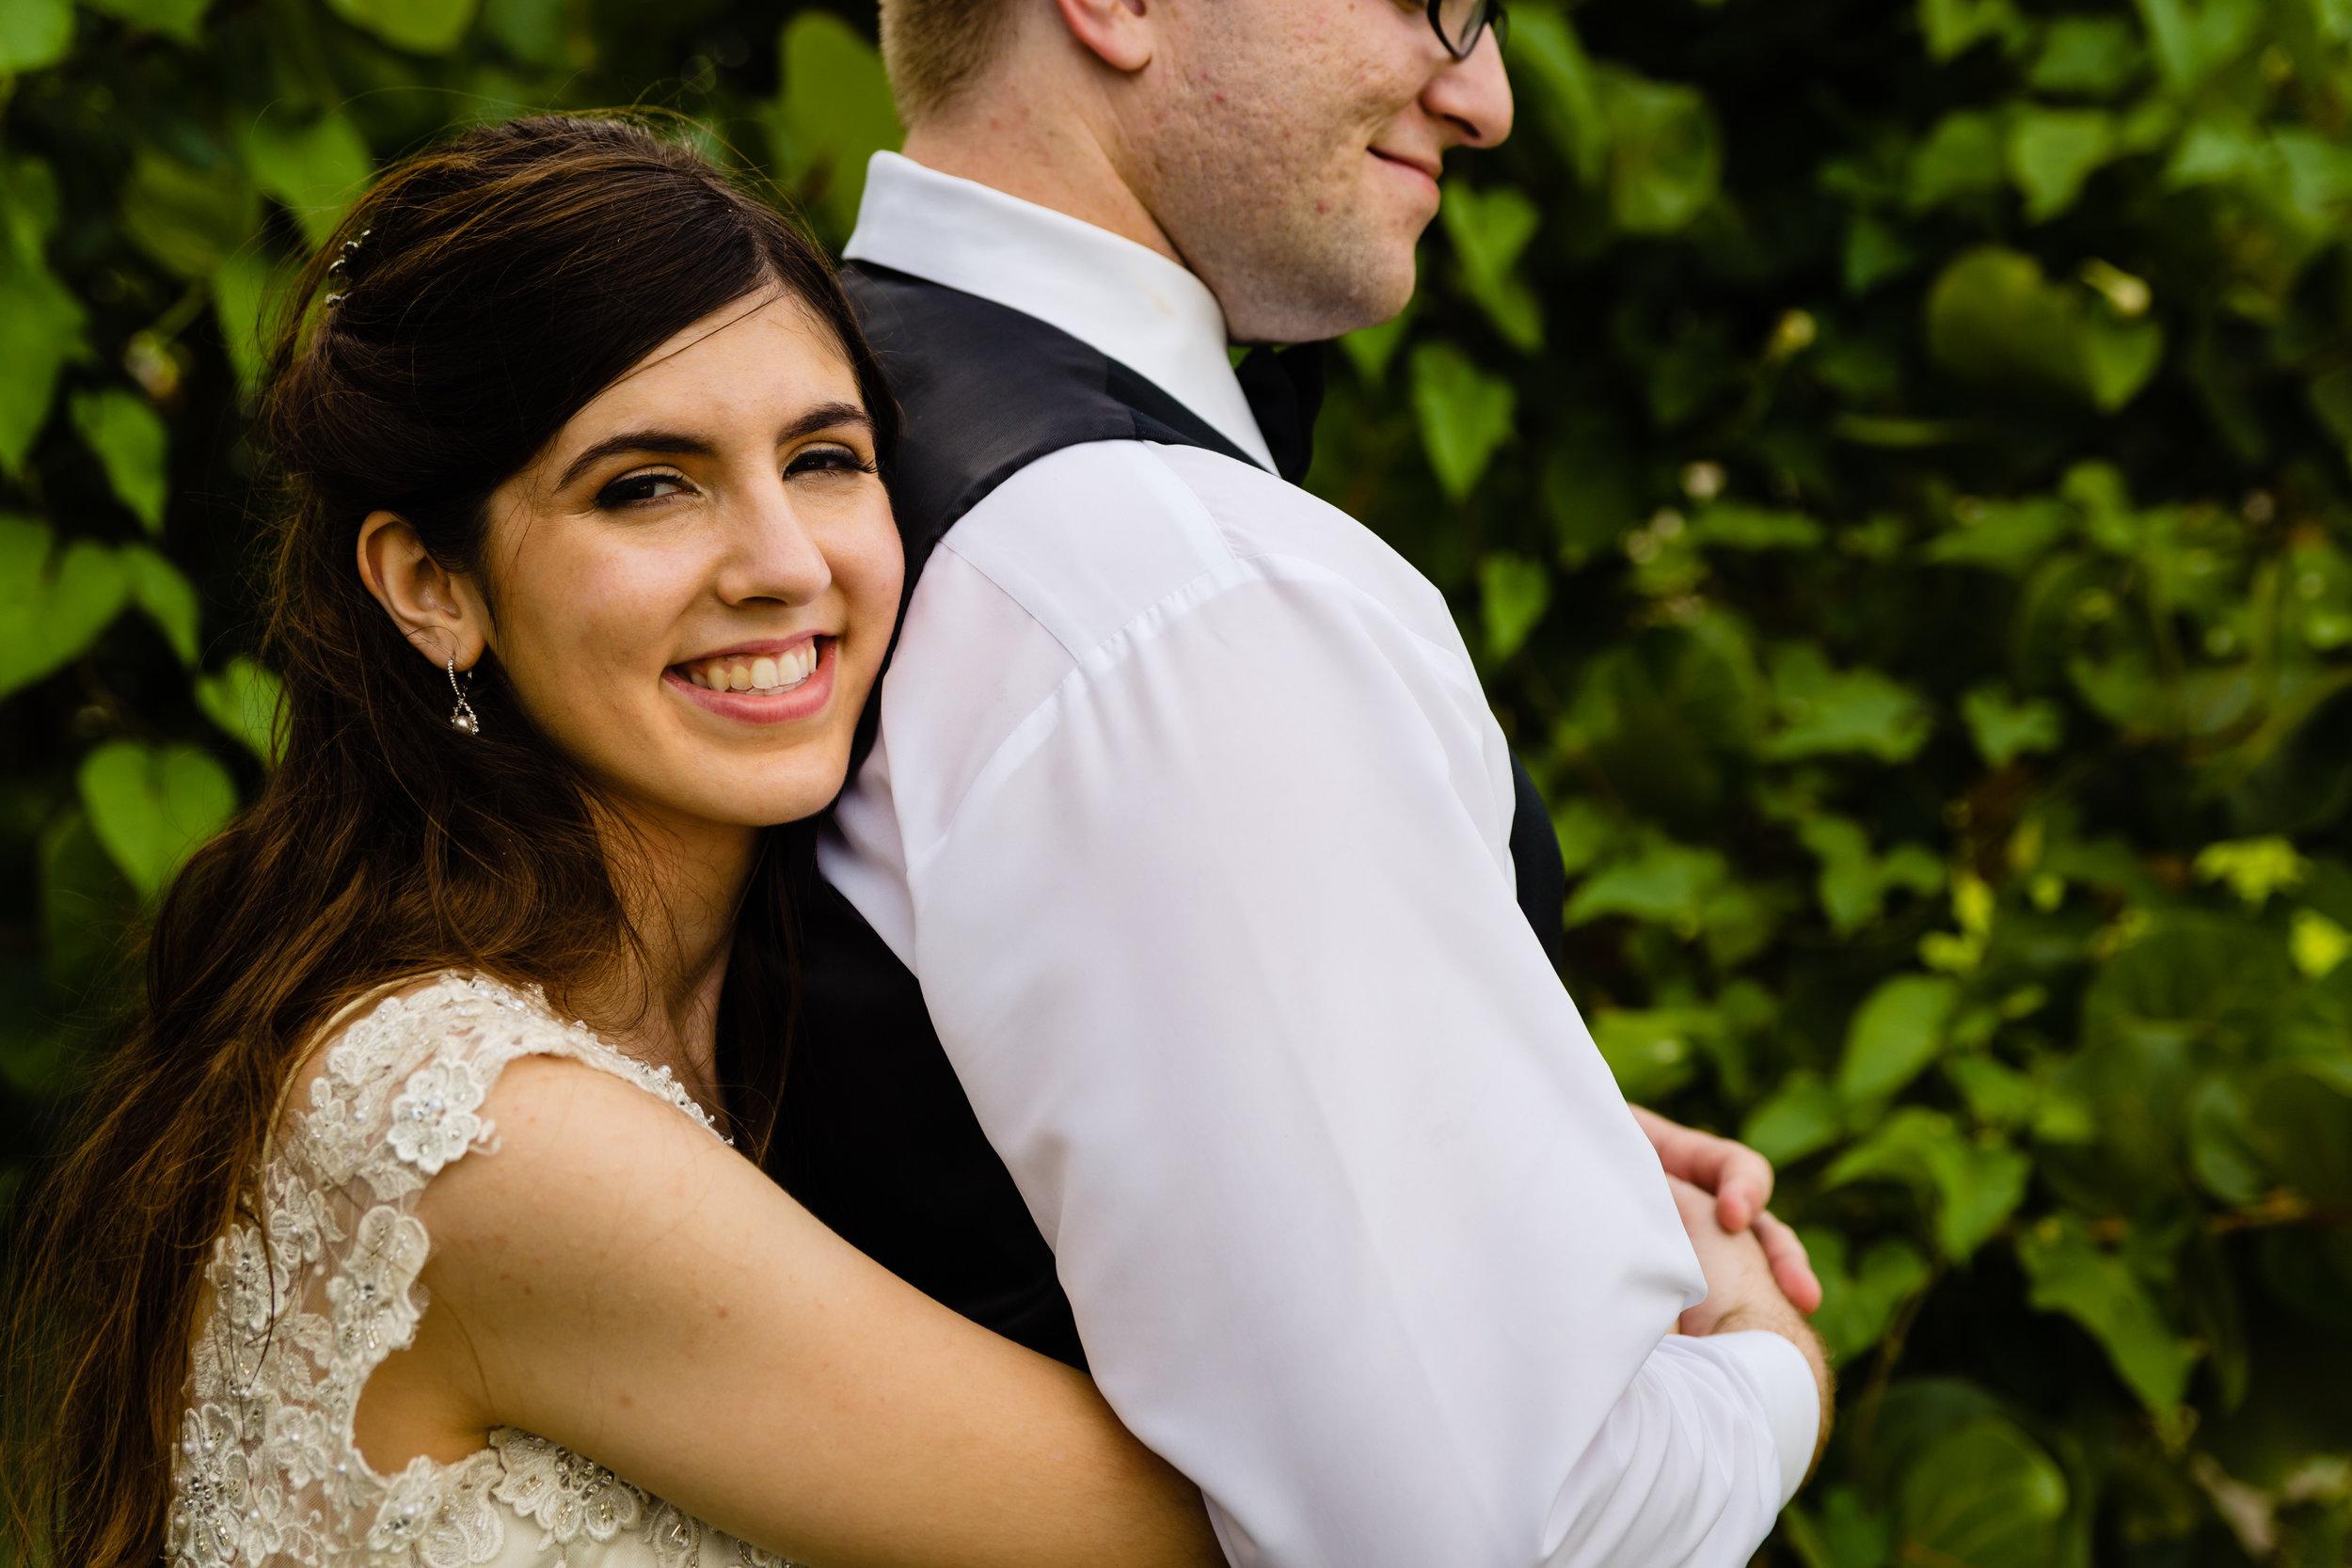 HAH_Zoe and Daniel_Clearwater Wedding_609_2018.jpg